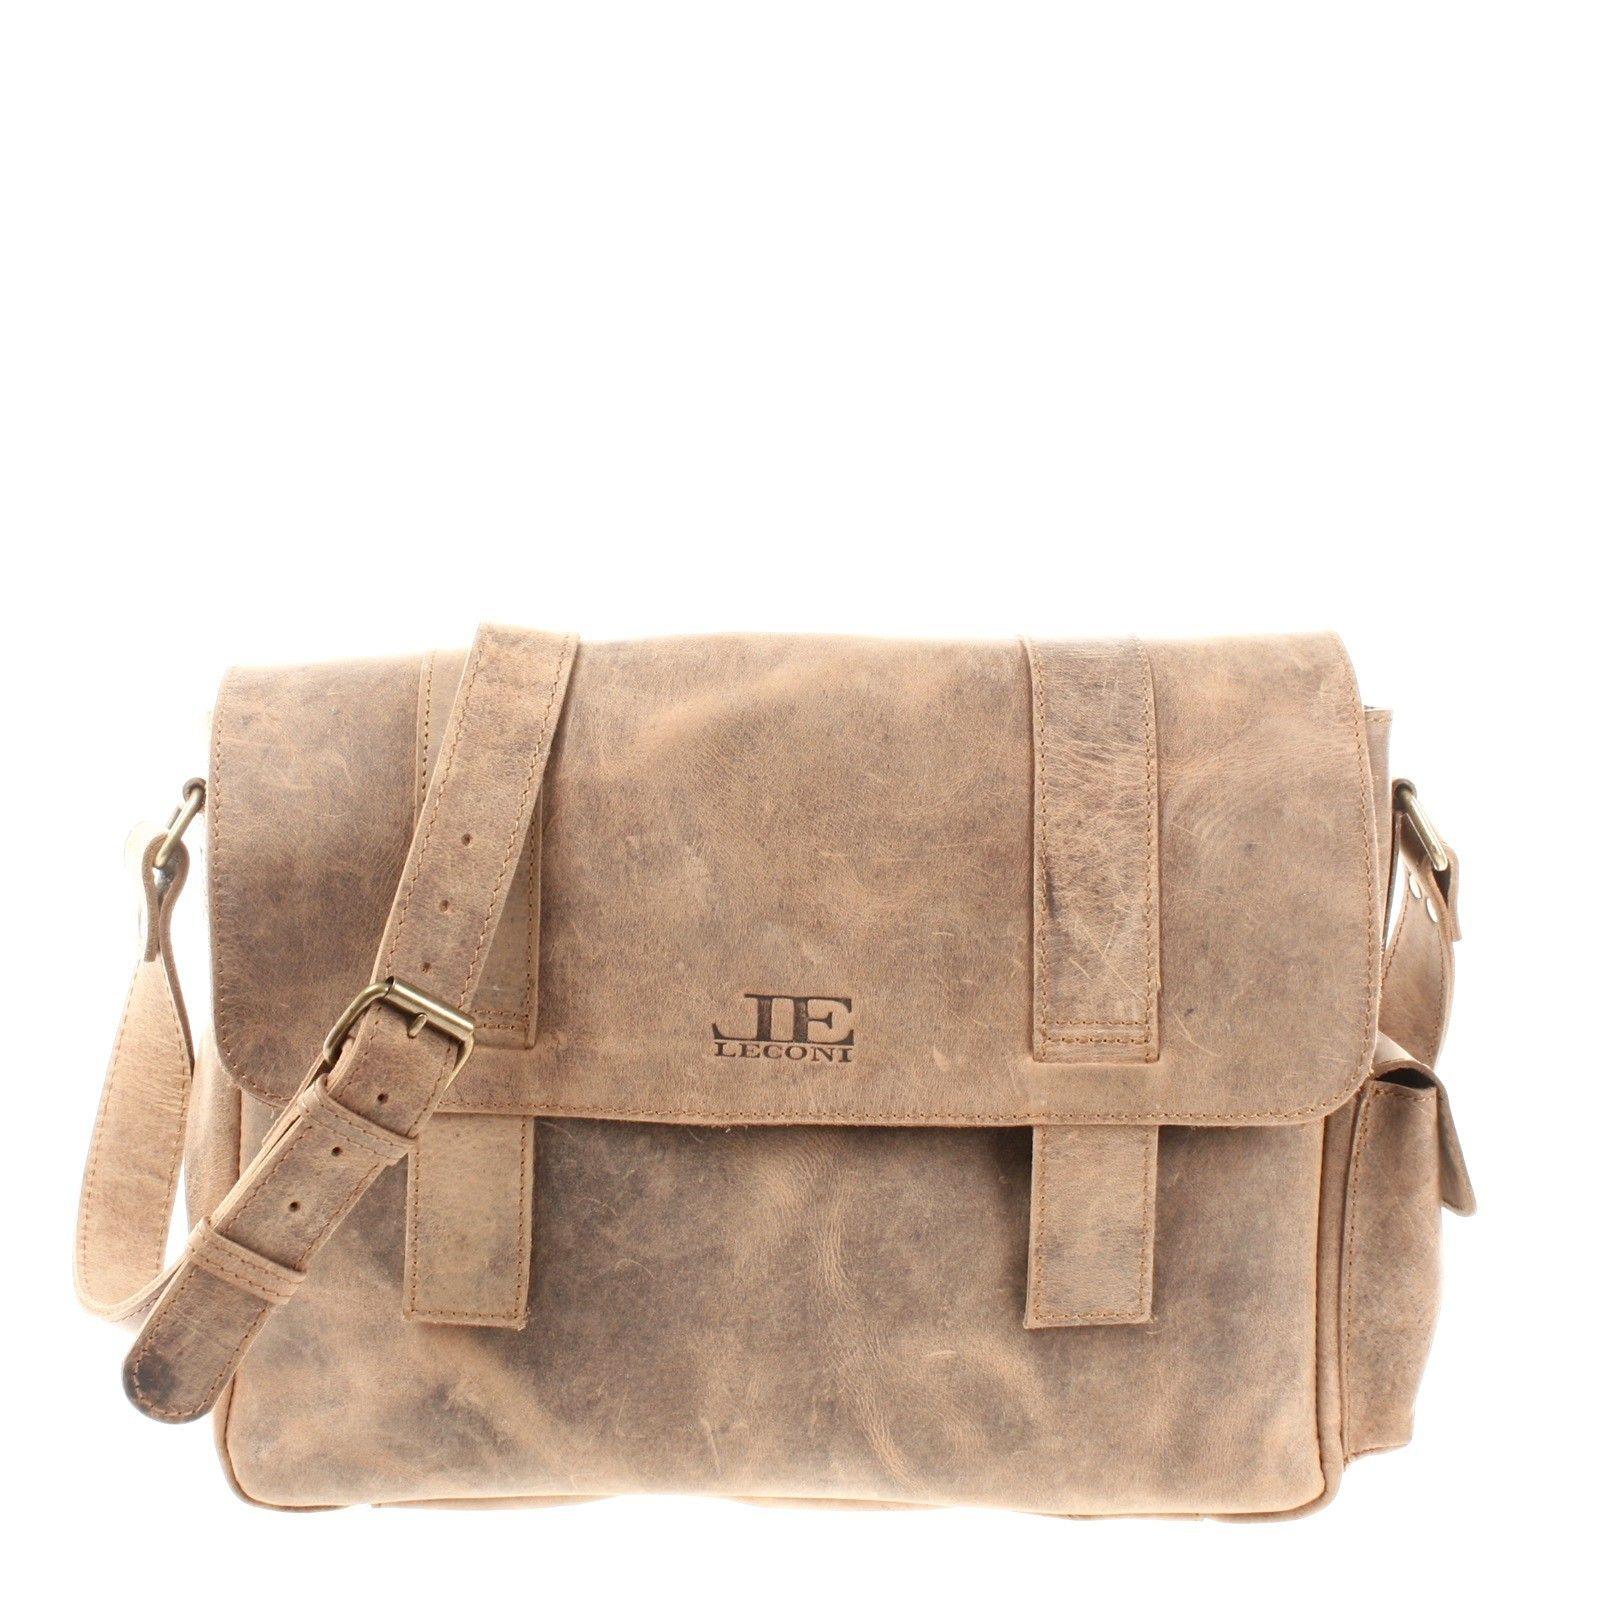 d7faf254f5a1a LECONI Messenger Bag Aktentasche Kuriertasche Vintage Leder braun LE3031